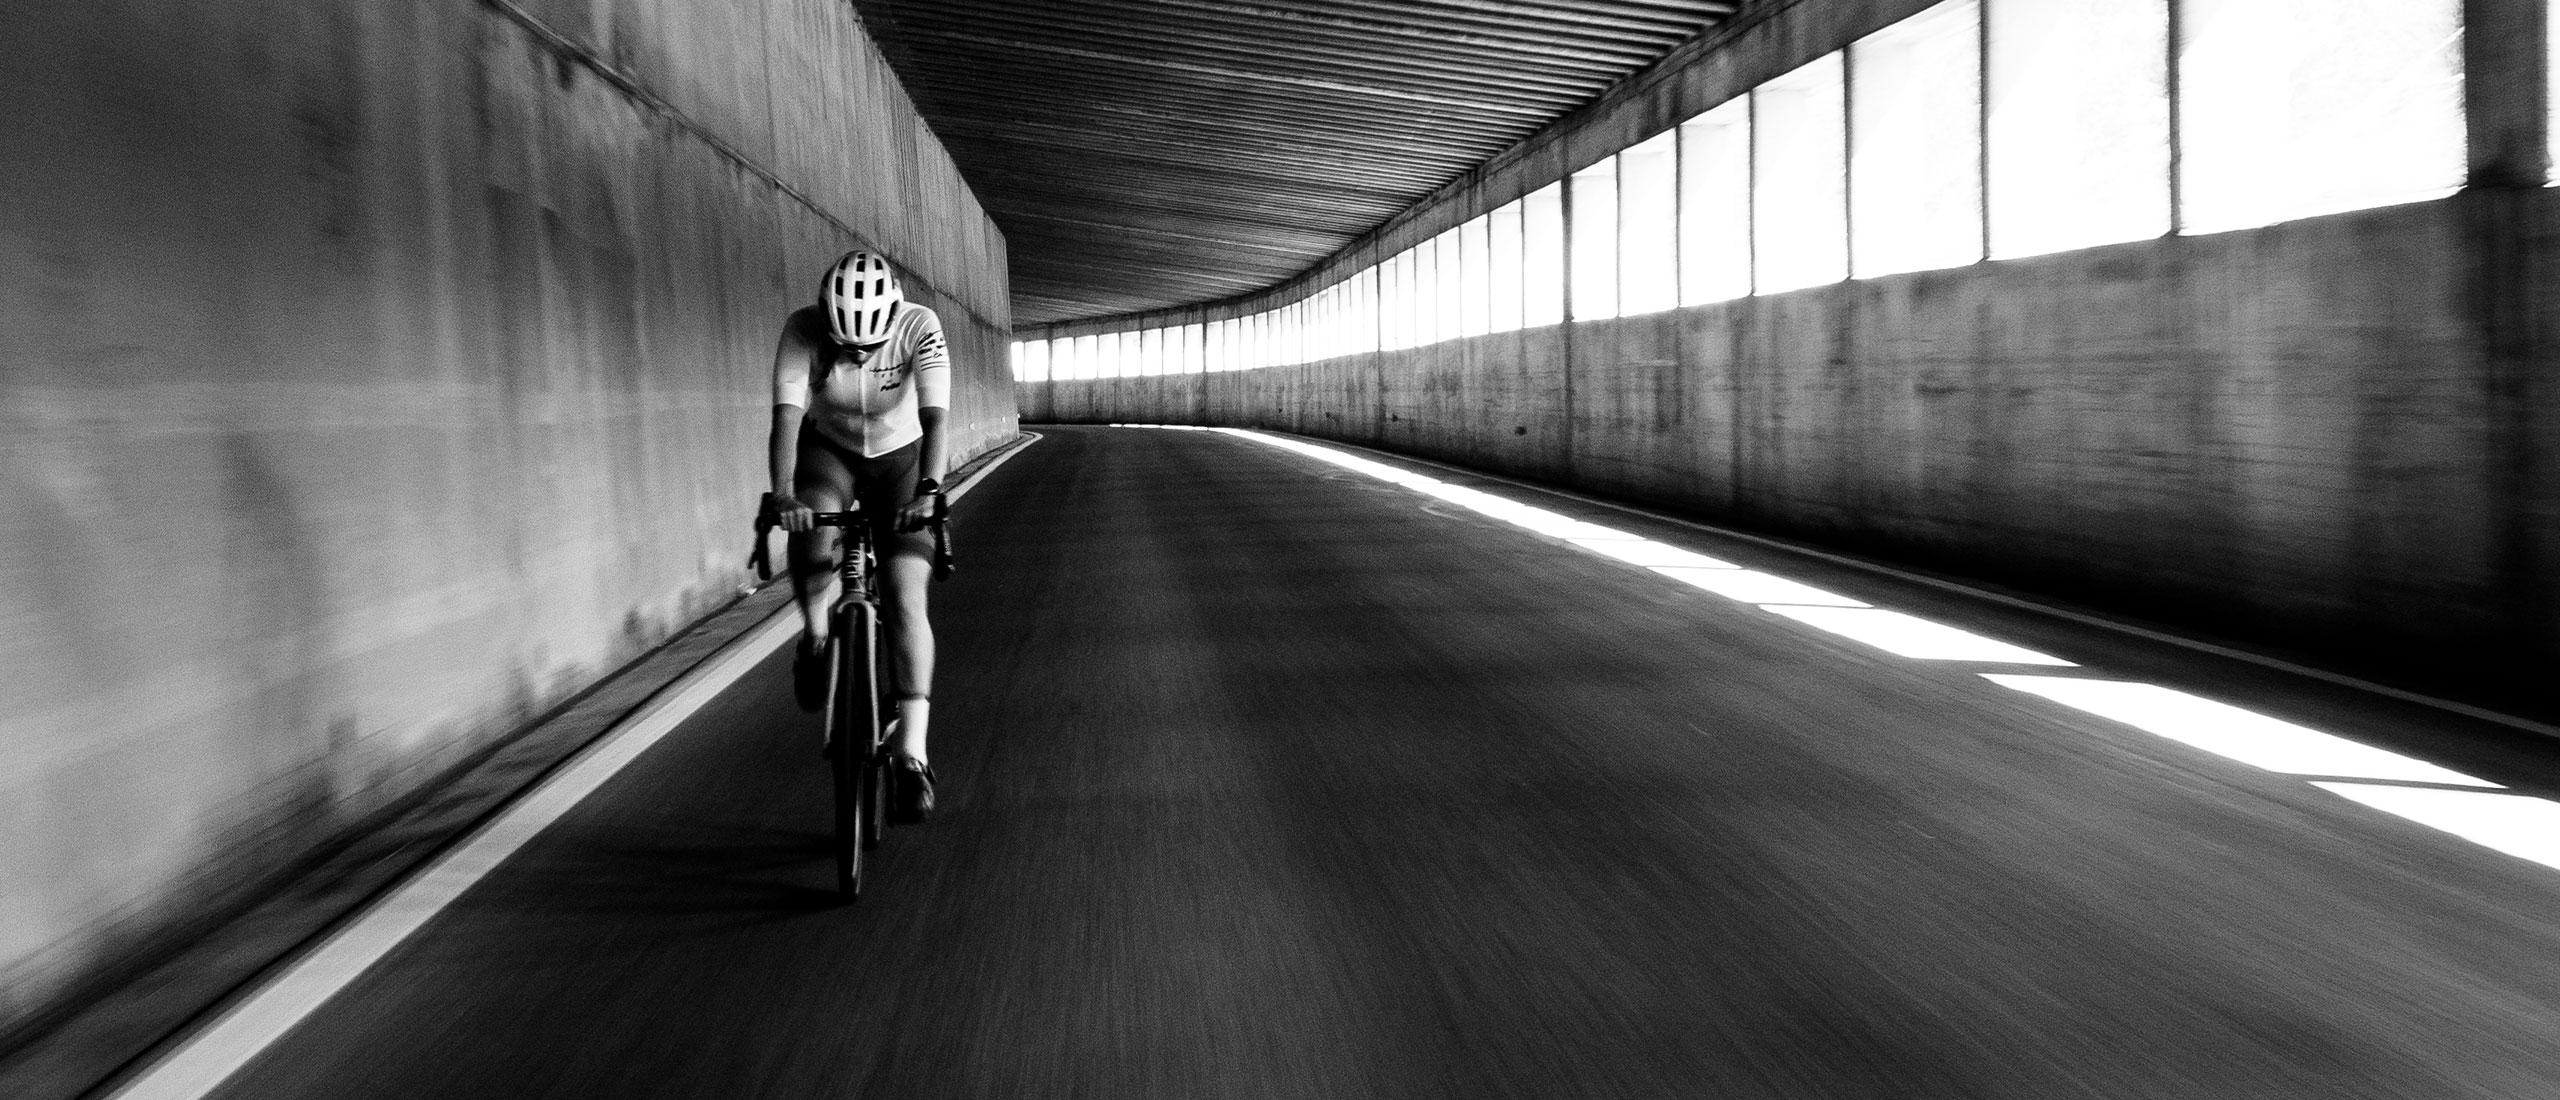 vinci-mips-cycling-helmet